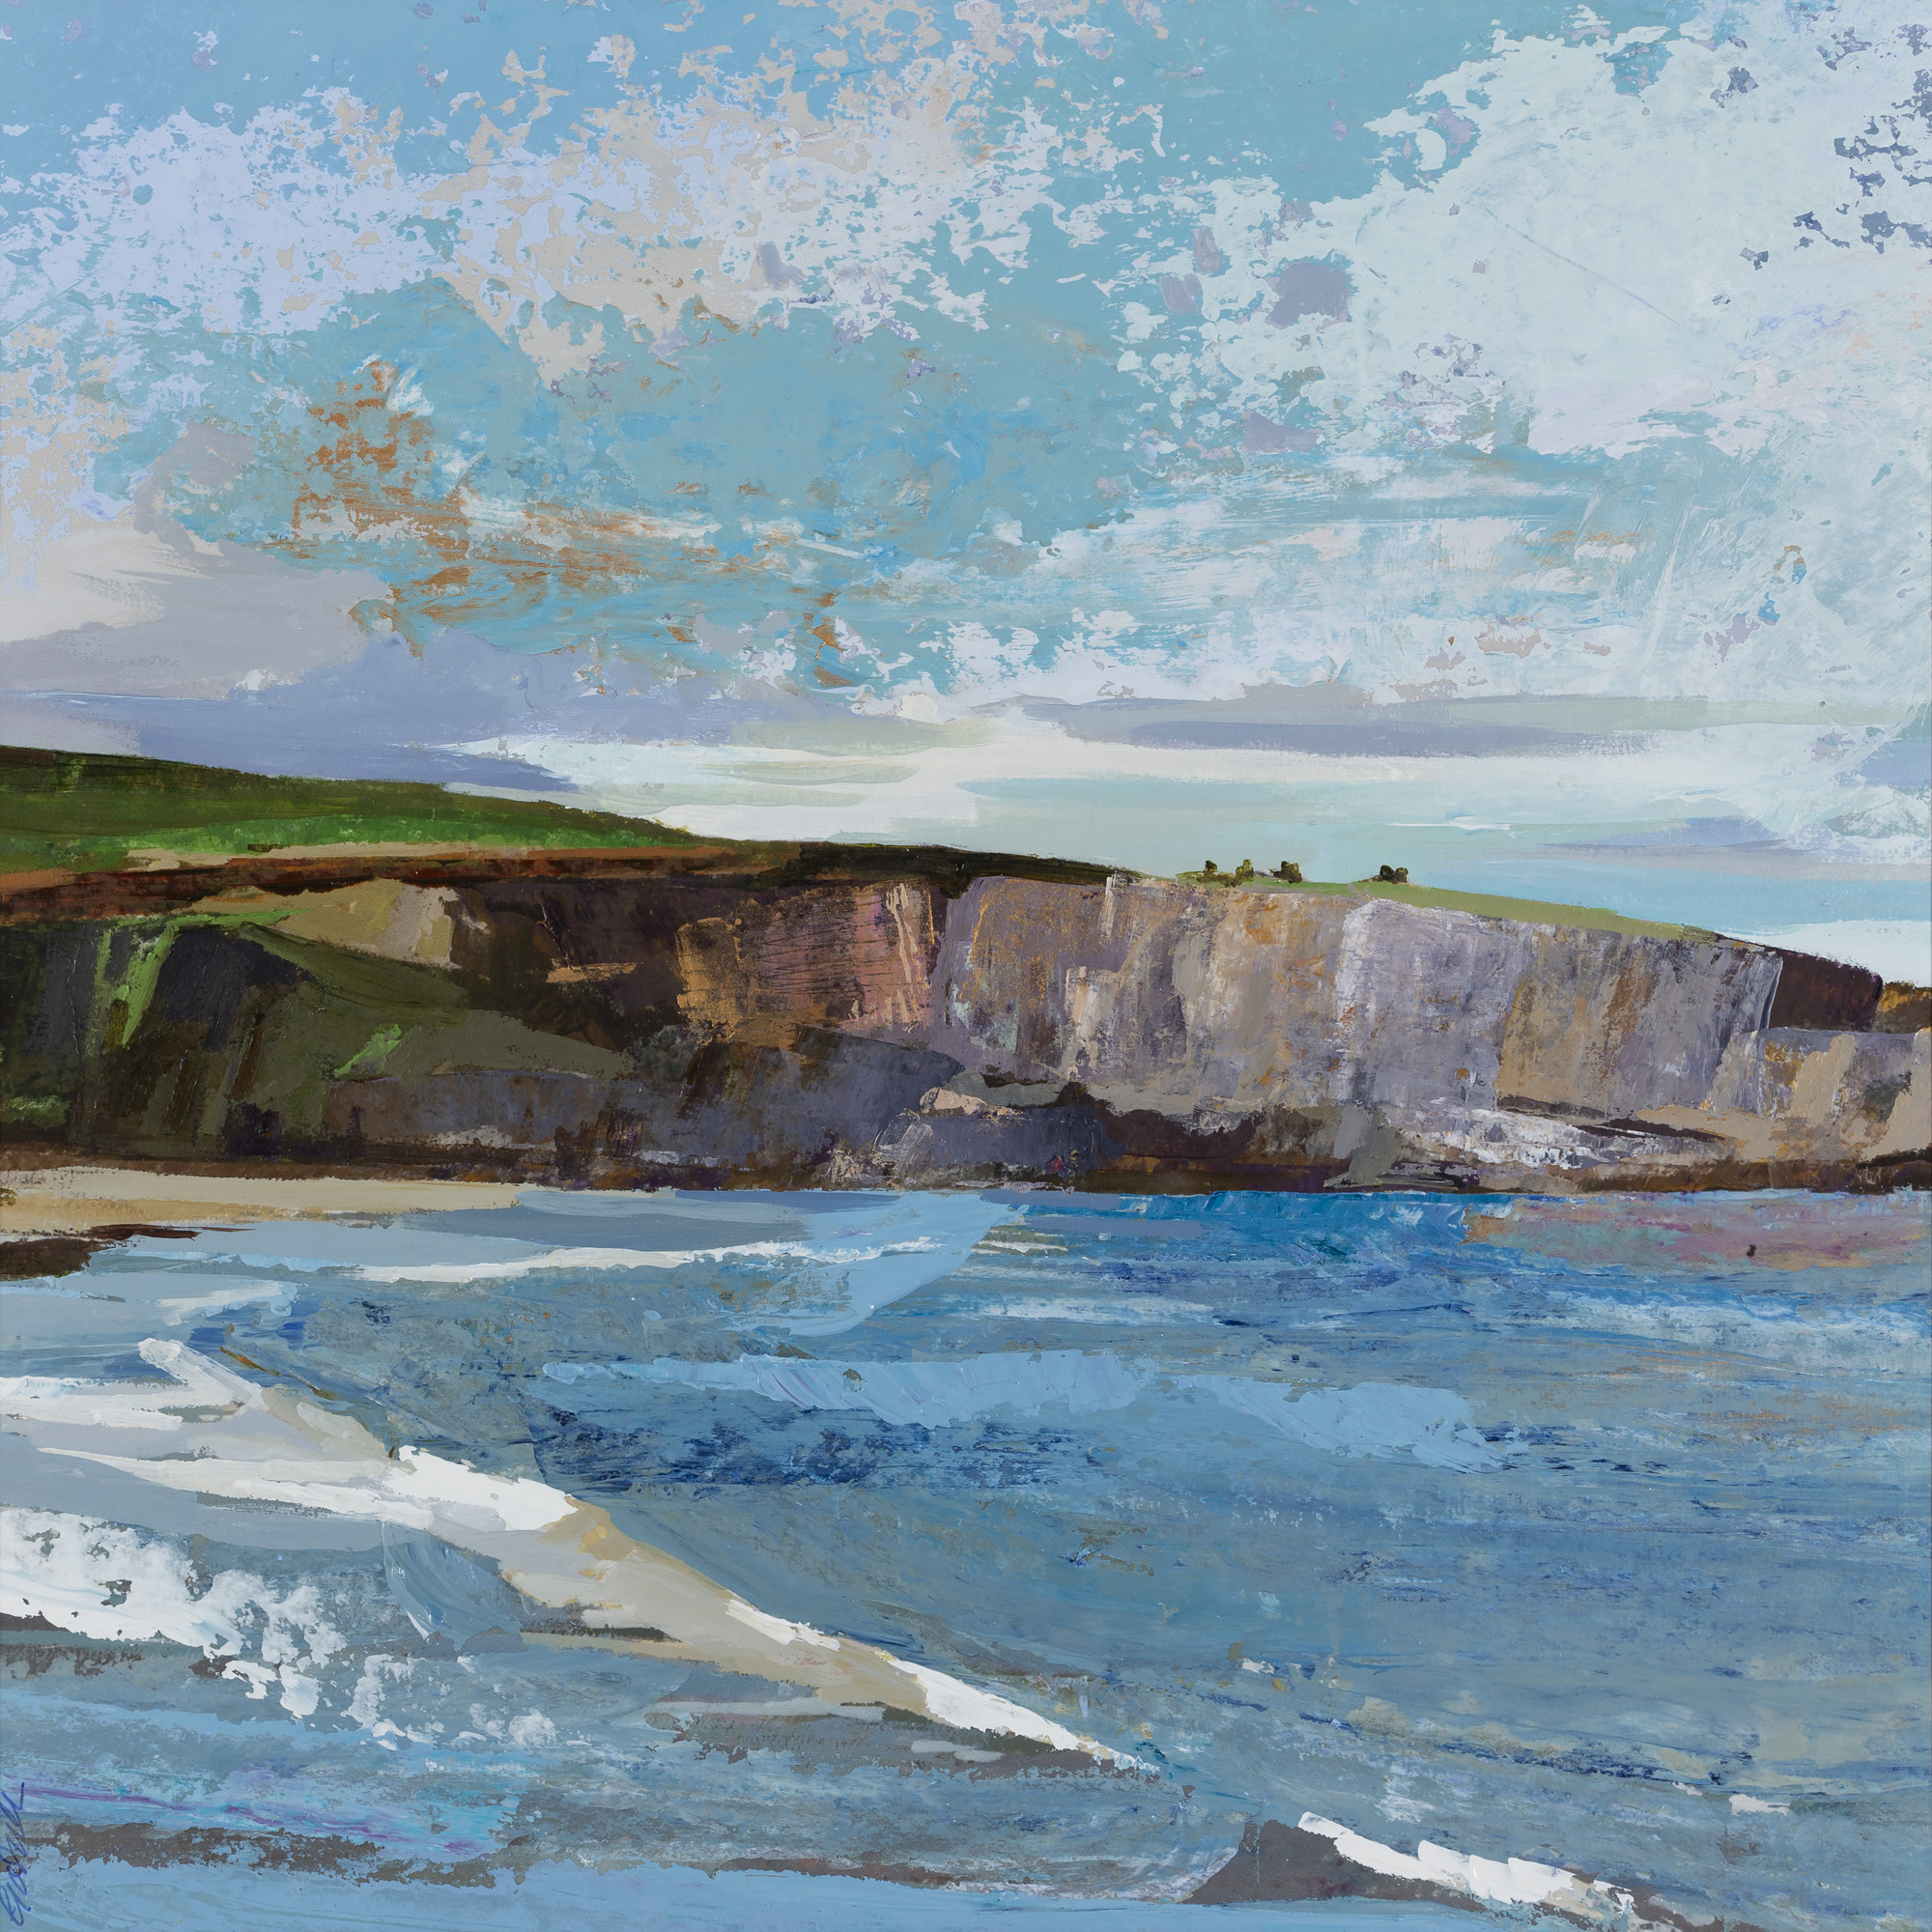 Duneen Strand Cliff Face Late Evening, 55x54.jpg